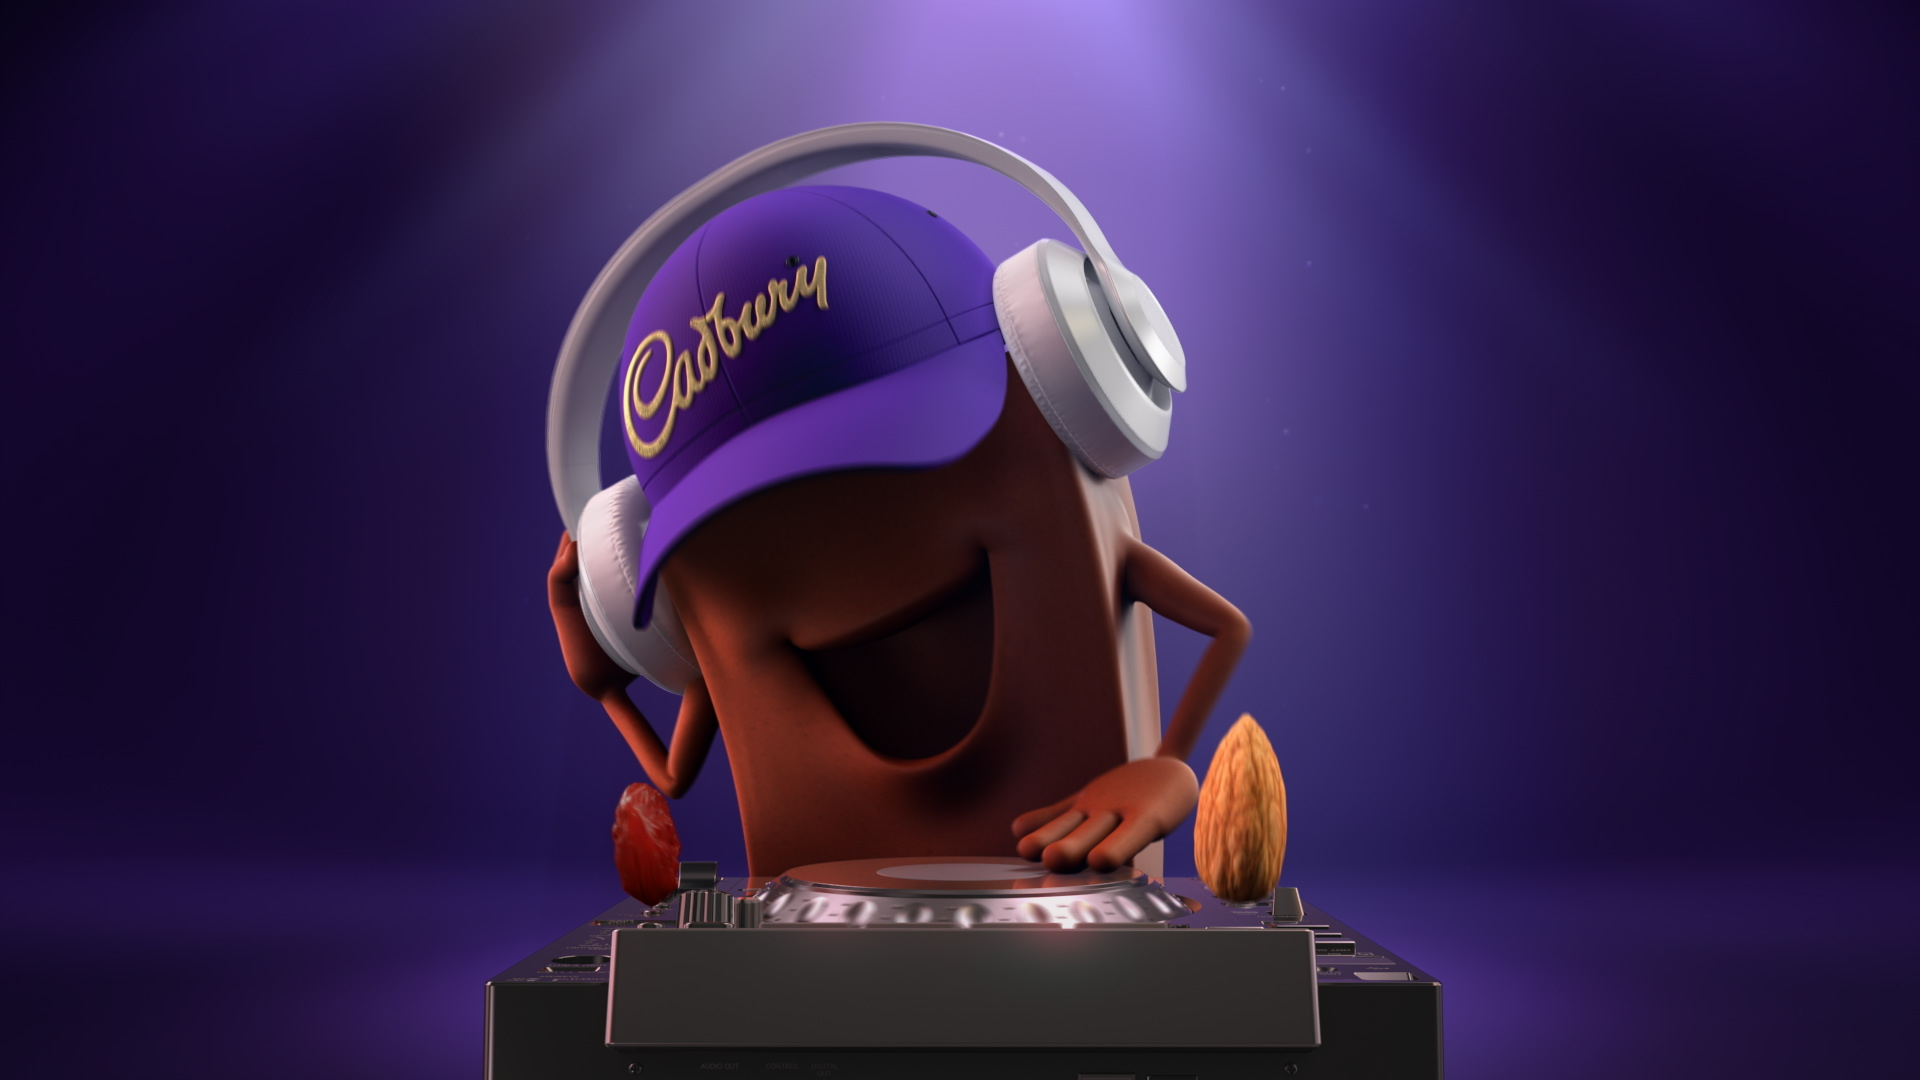 Cadbury fruit nut whatflavourdoyoufavour aroma studios cadbury fruit thecheapjerseys Choice Image